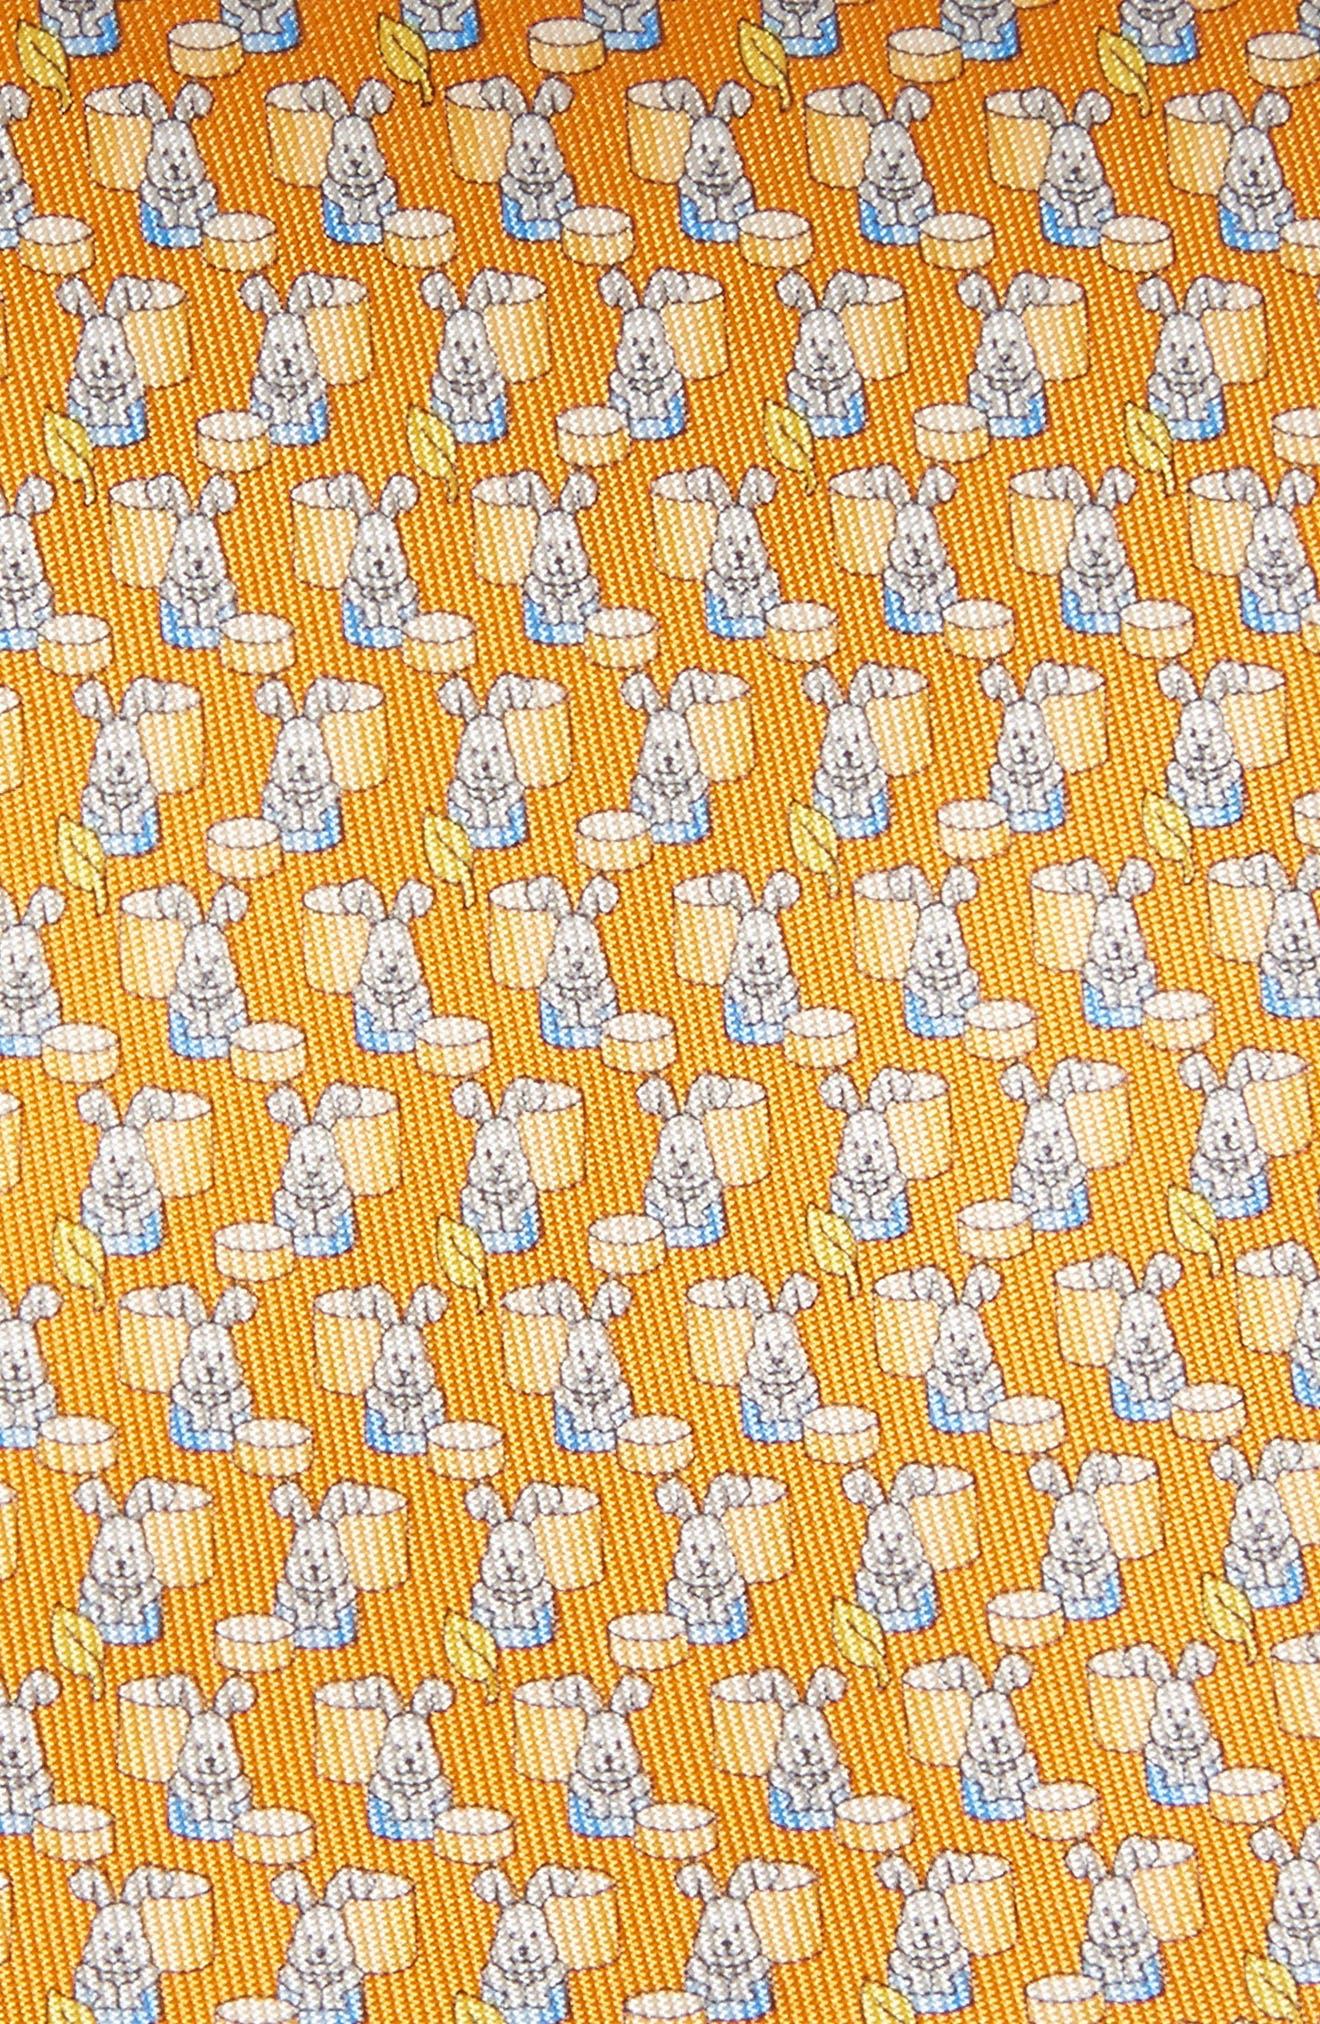 Bunny Print Silk Tie,                             Alternate thumbnail 2, color,                             Orange